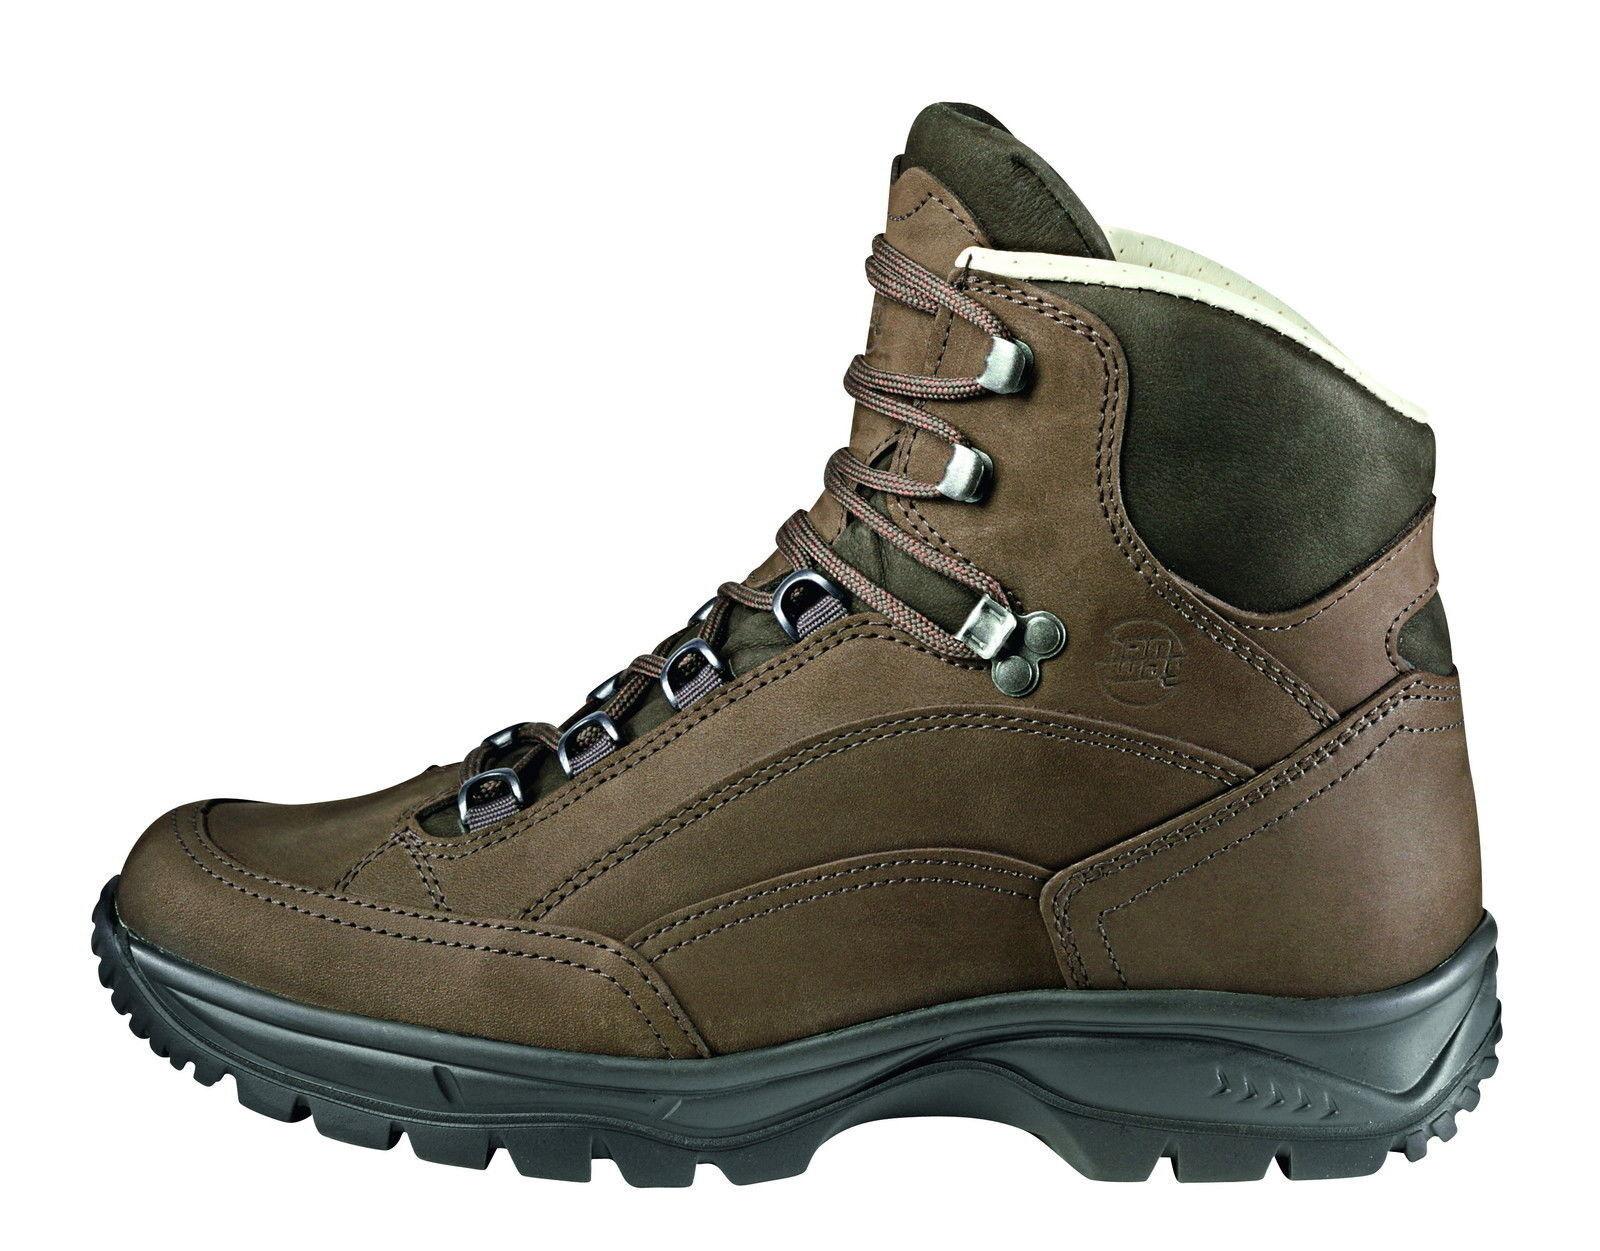 Hanwag Mountain shoes Canyon Men II, Leather Earth Size 9,5 - 44